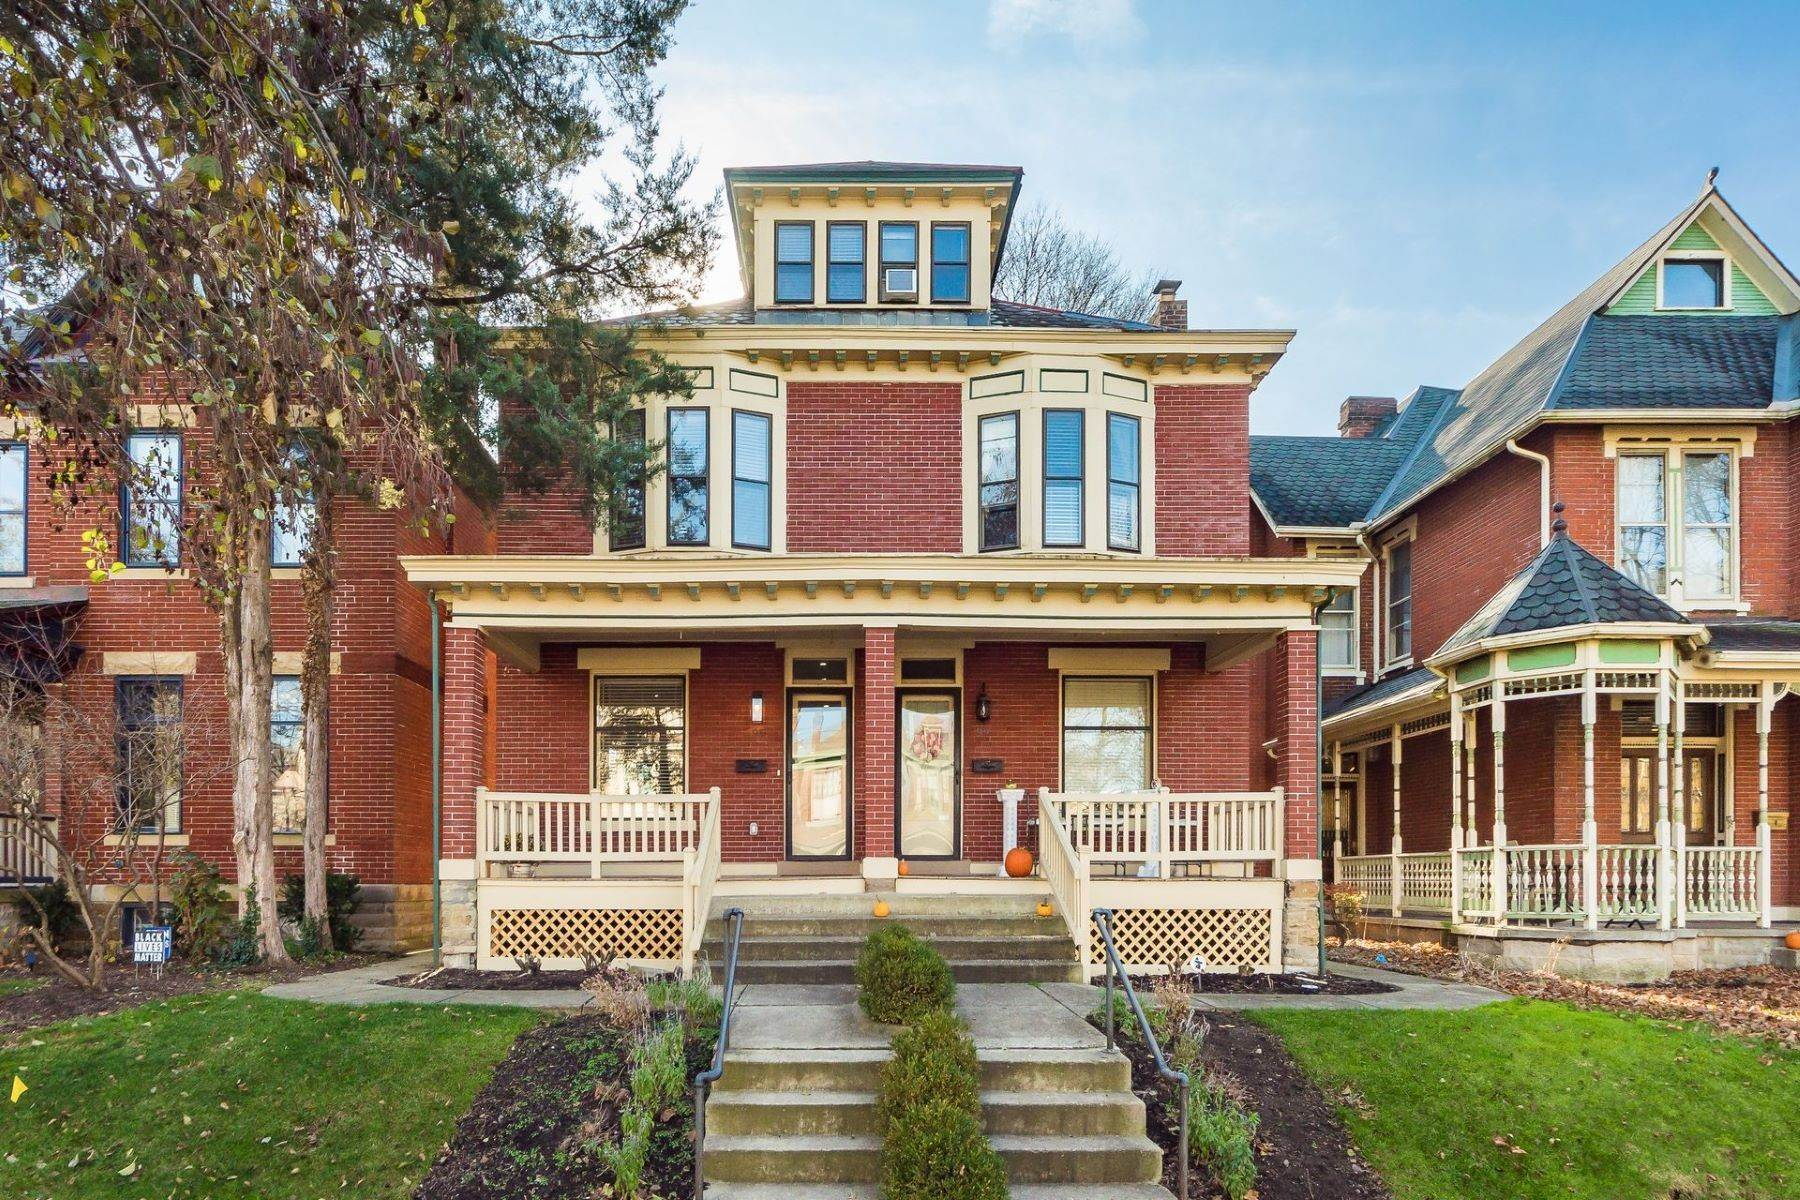 2. Condominiums for Sale at 99 W Hubbard Avenue 99 West Hubbard Columbus, Ohio 43215 United States